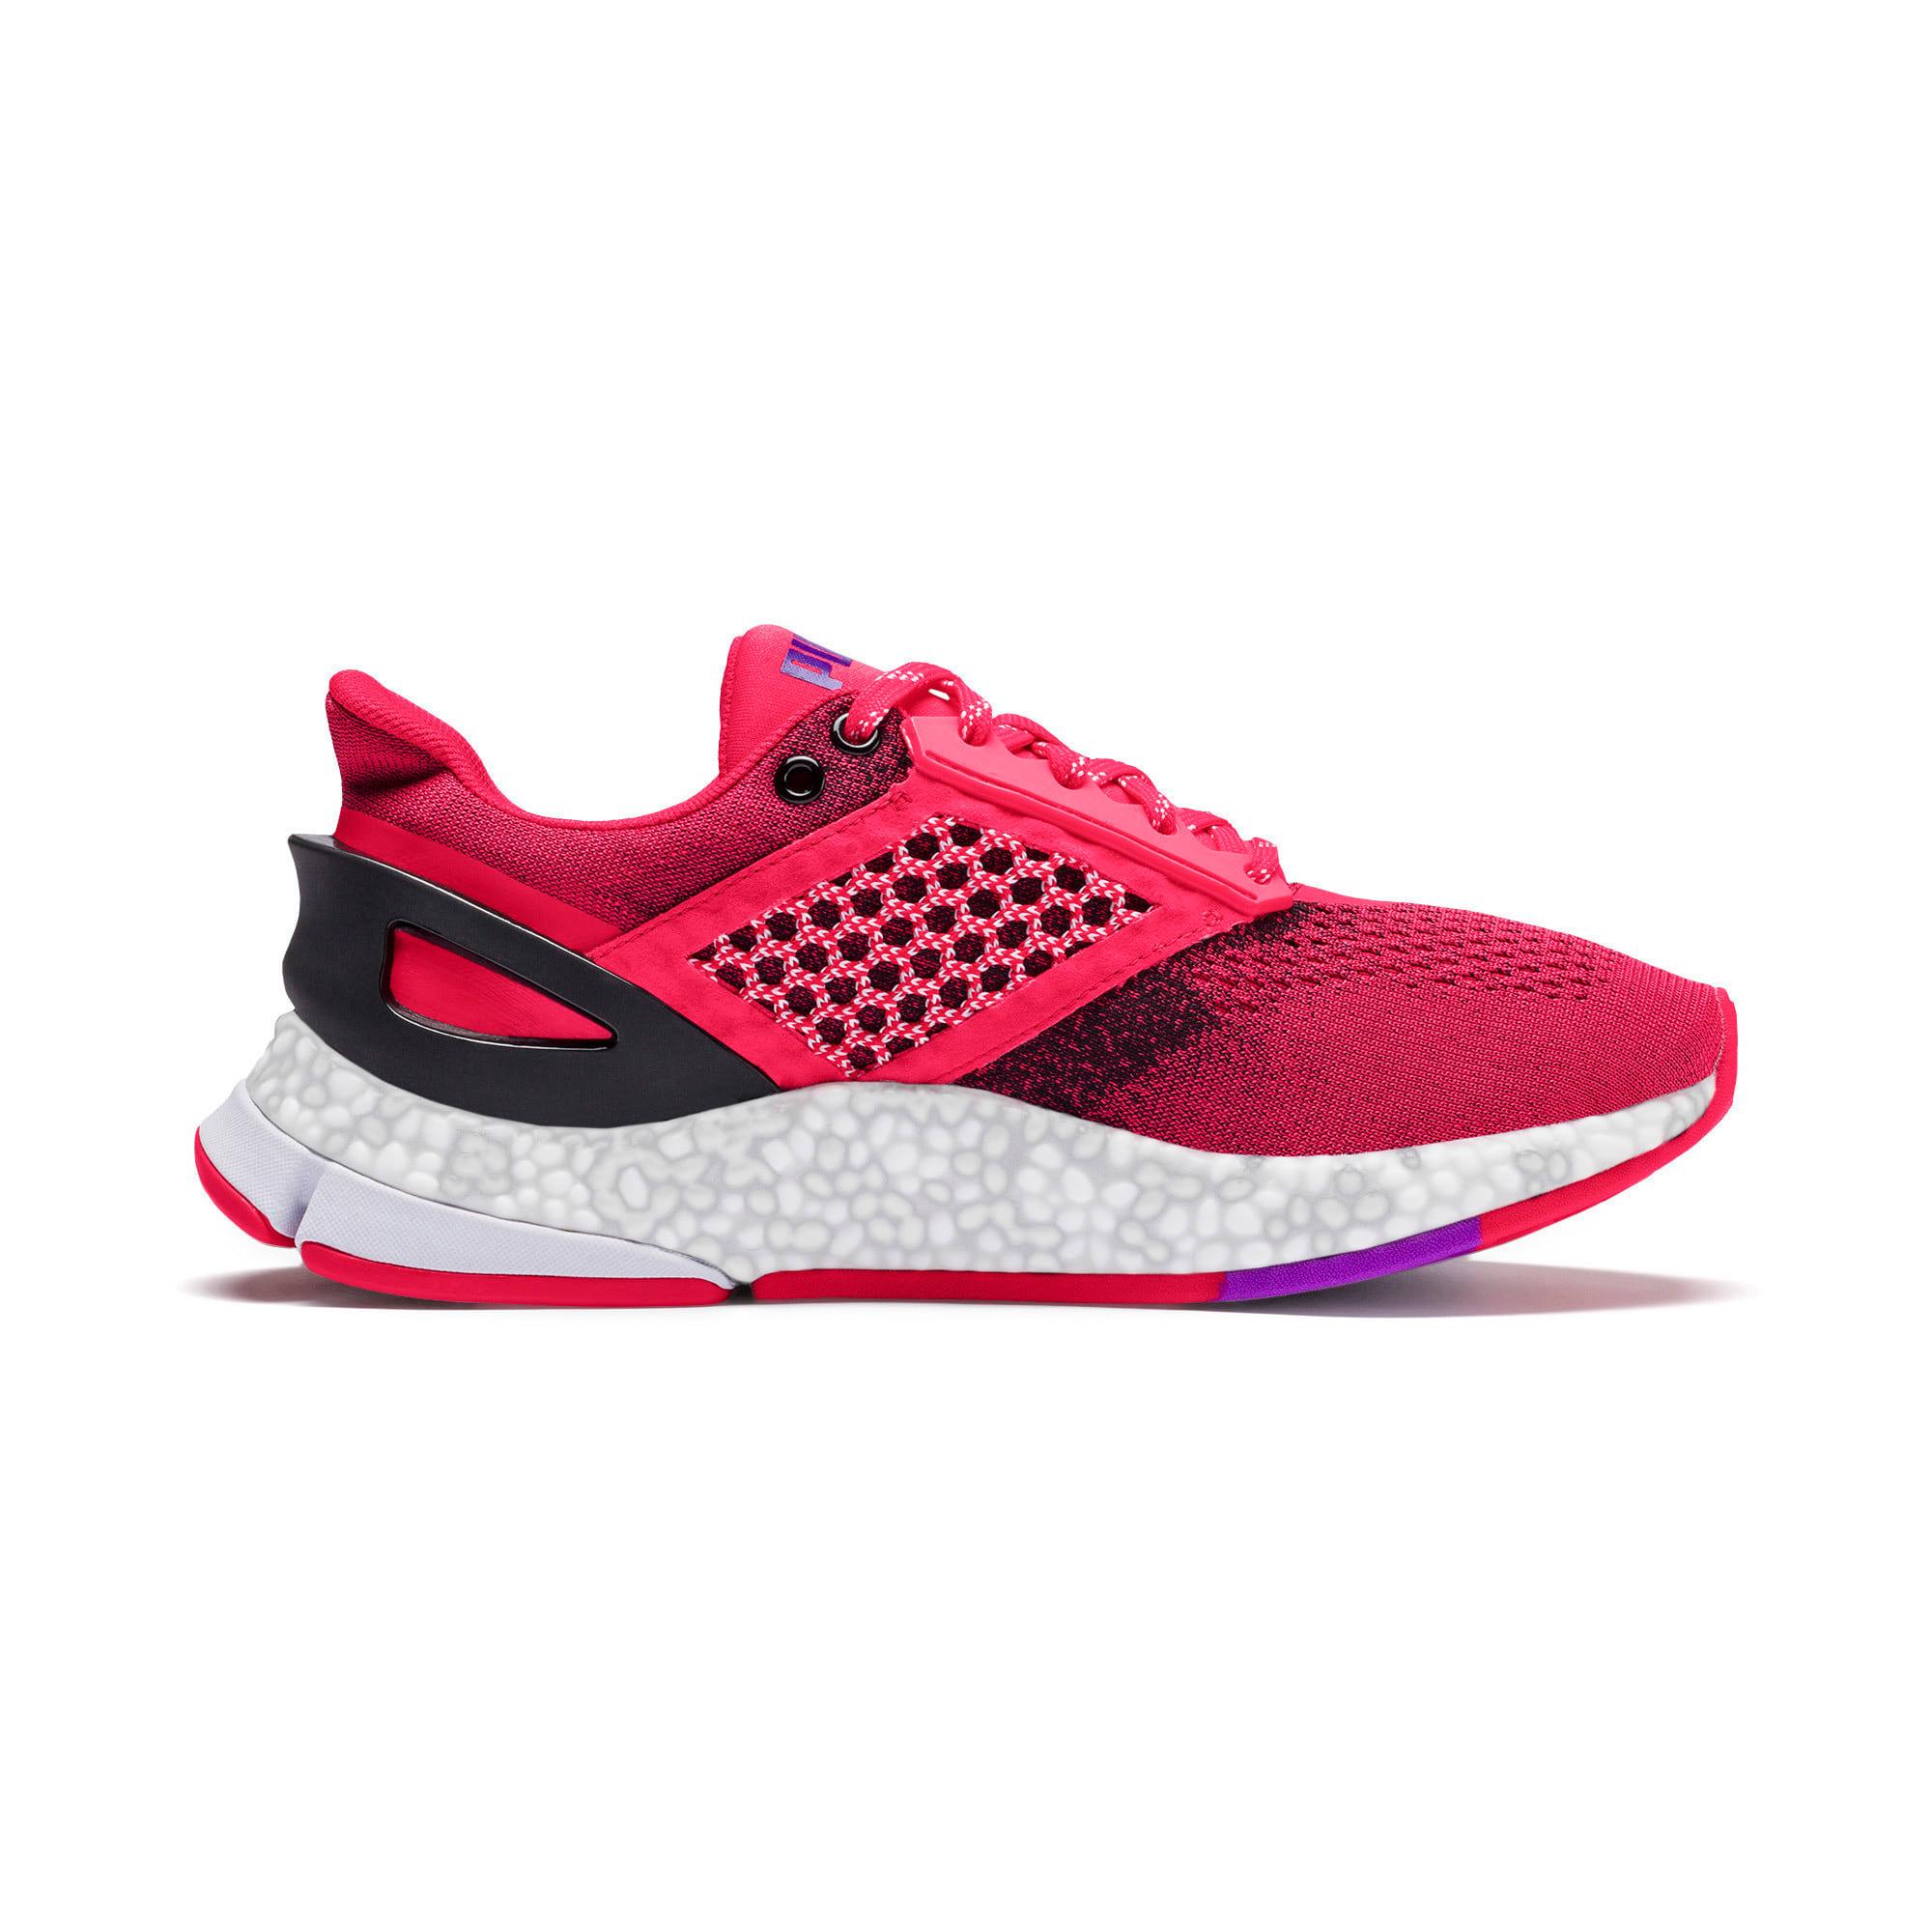 Thumbnail 8 of HYBRID NETFIT Astro Women's Running Shoes, Nrgy Rose-Puma Black, medium